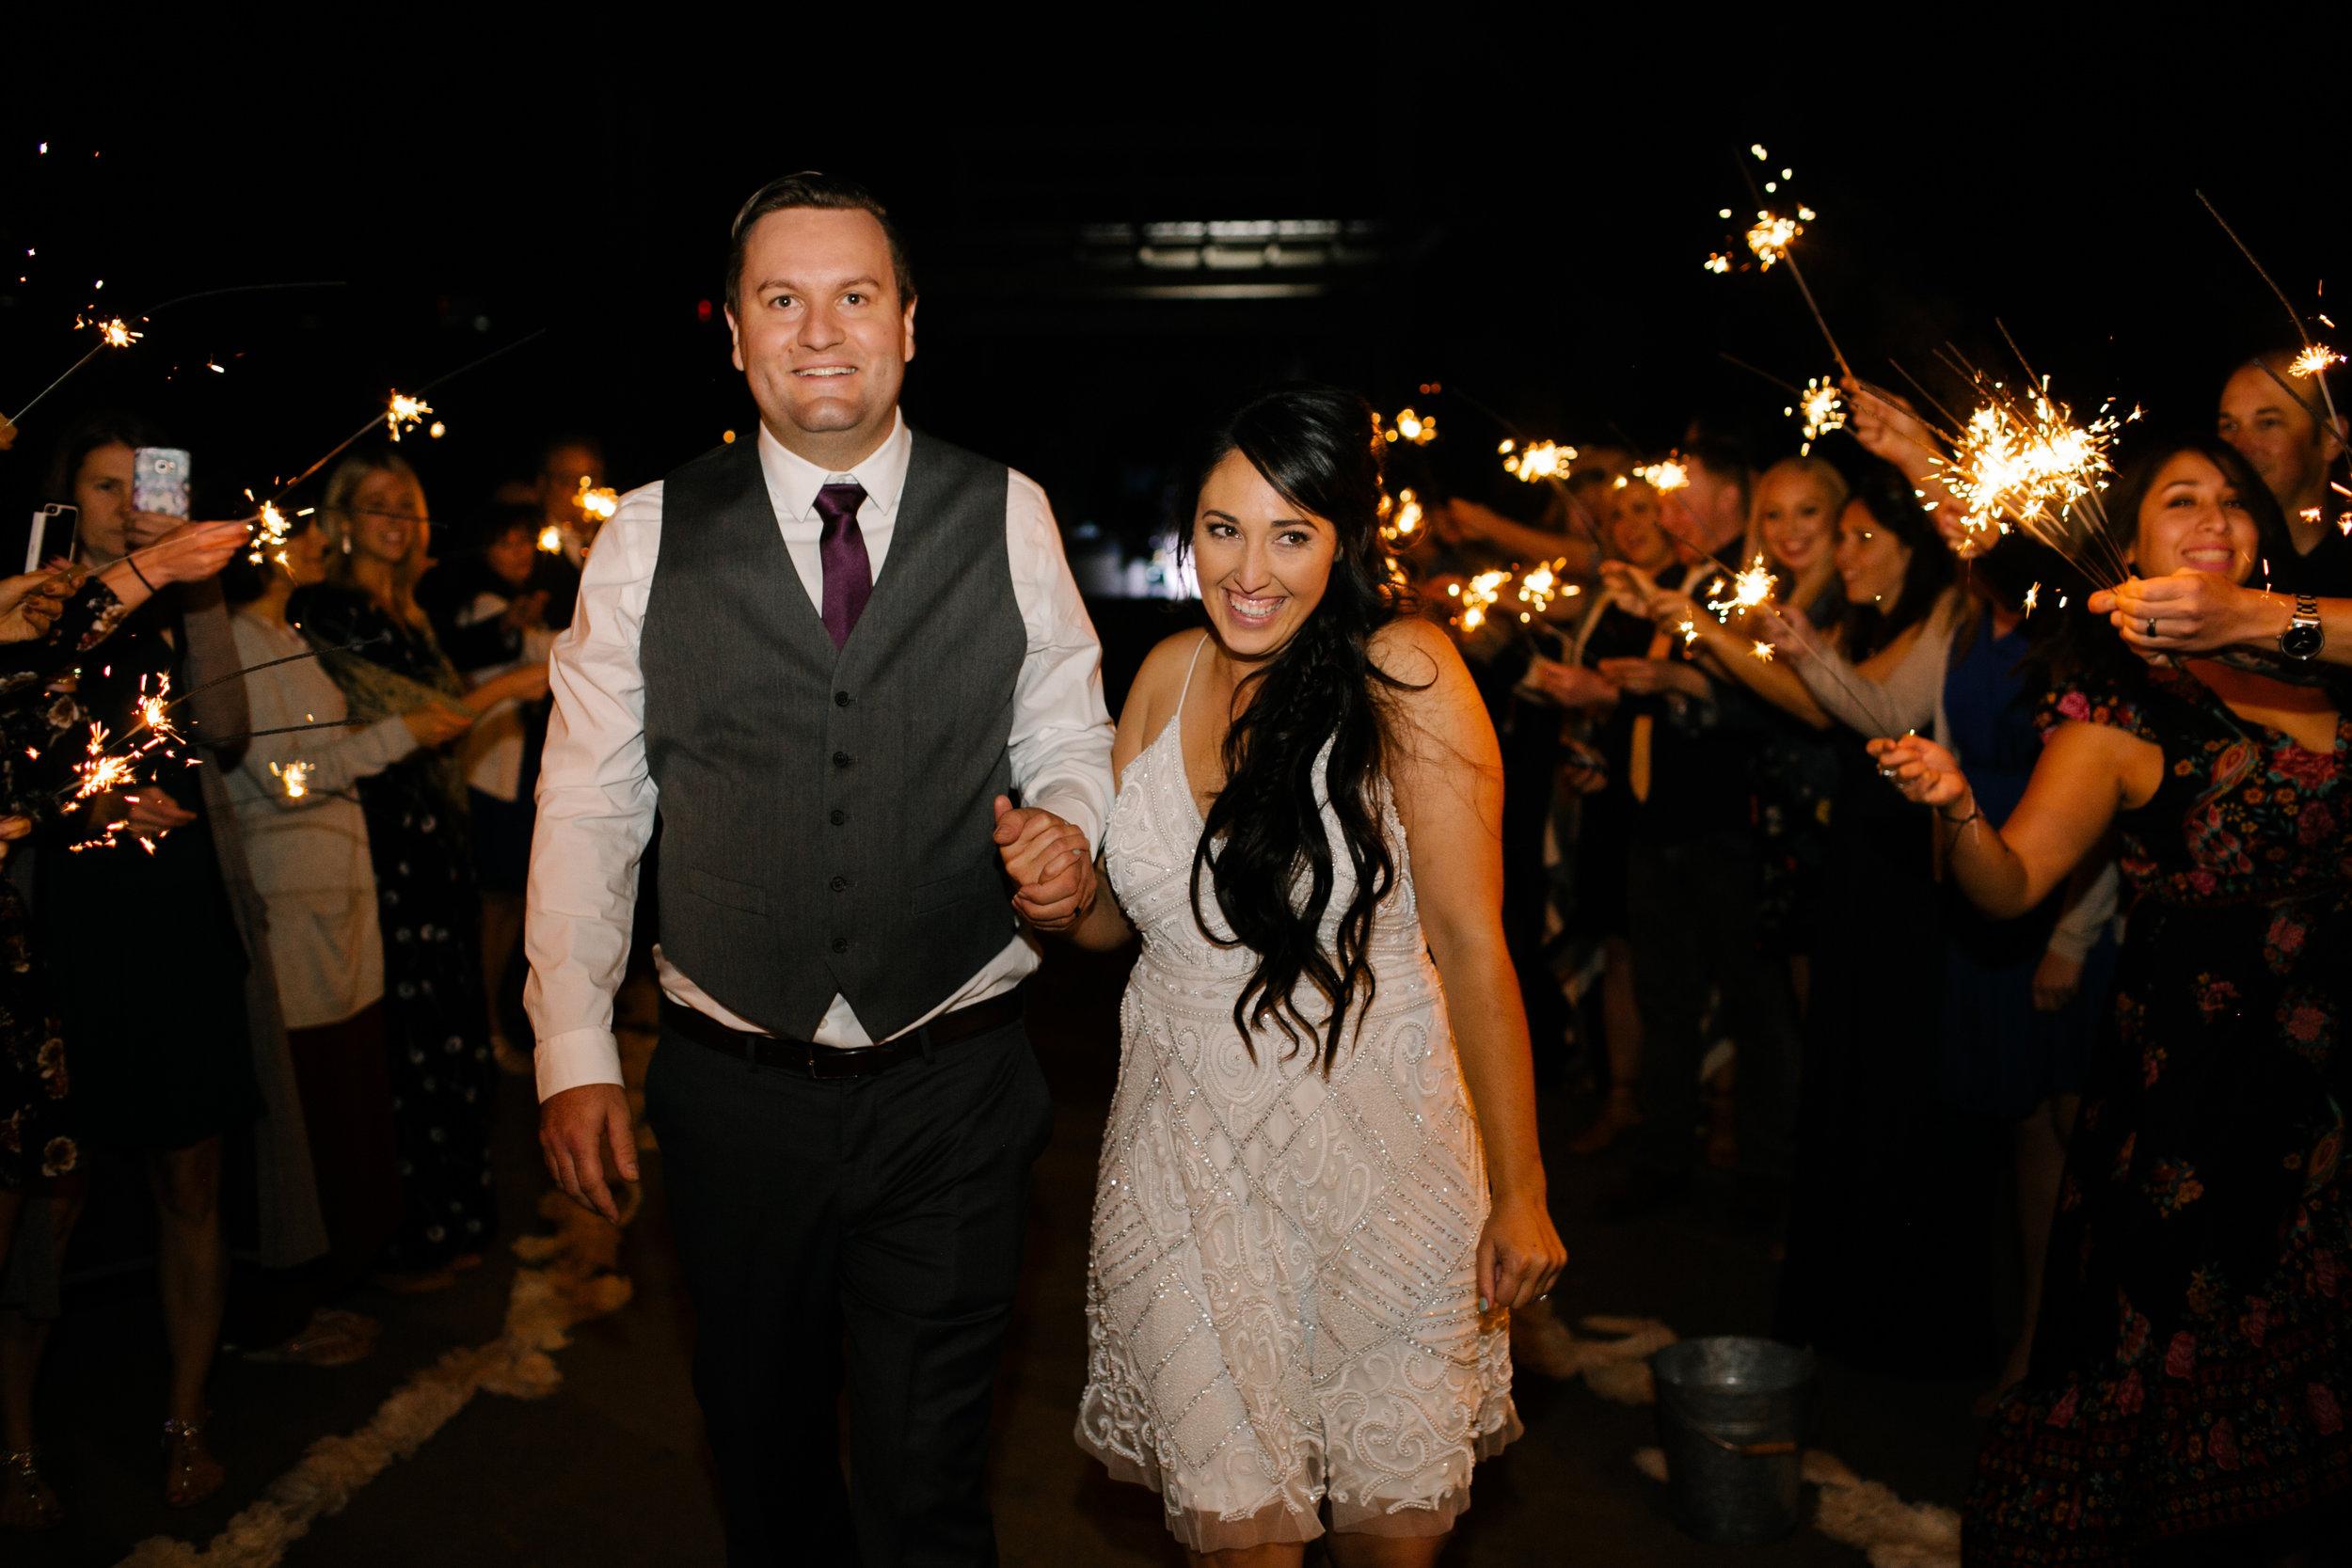 Sevlynn-Photography-Teresa-Chandler-Wedding-70.jpg